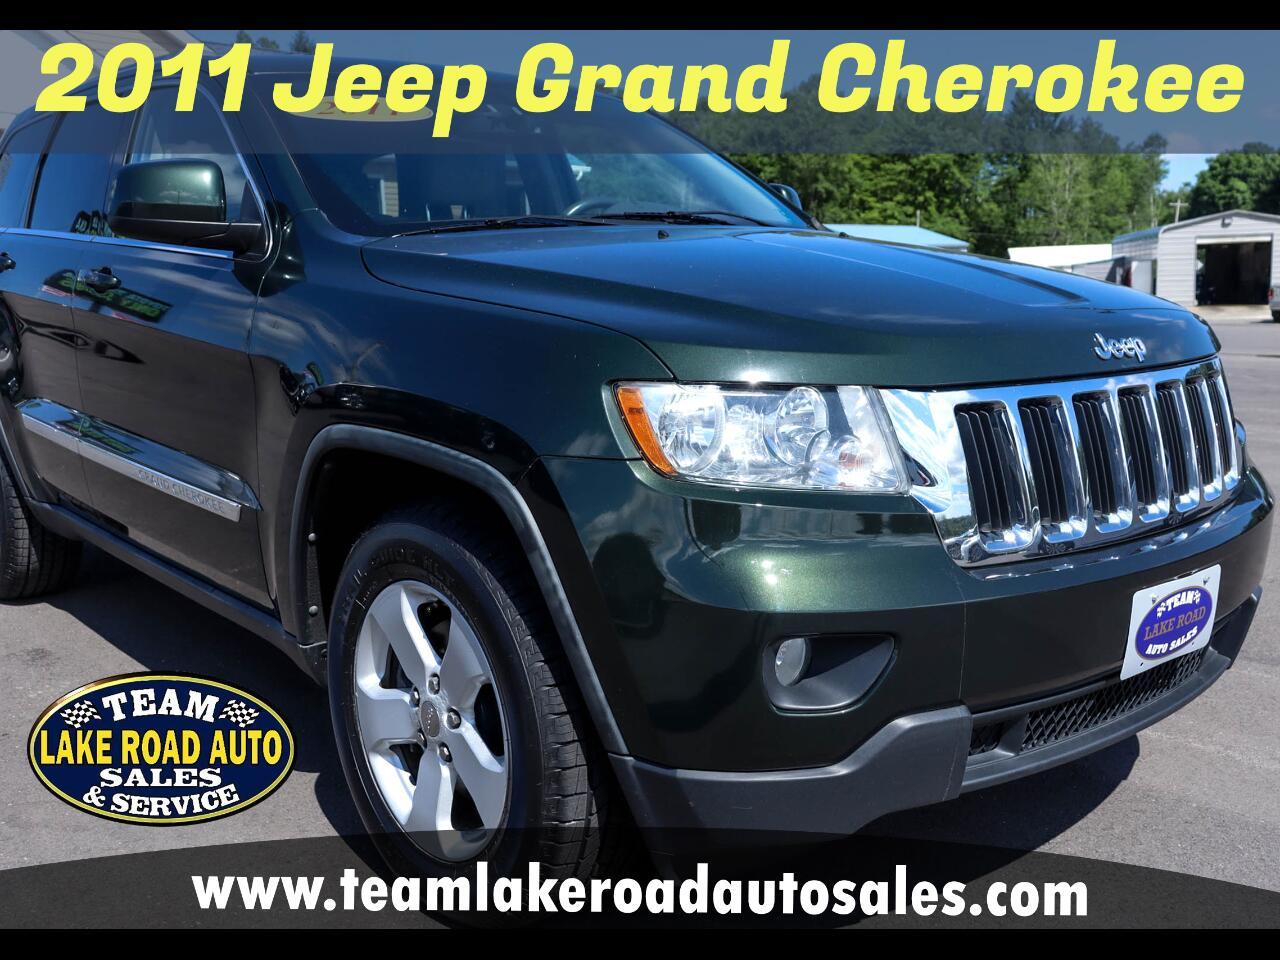 Jeep Grand Cherokee 4WD 4dr Laredo 2011